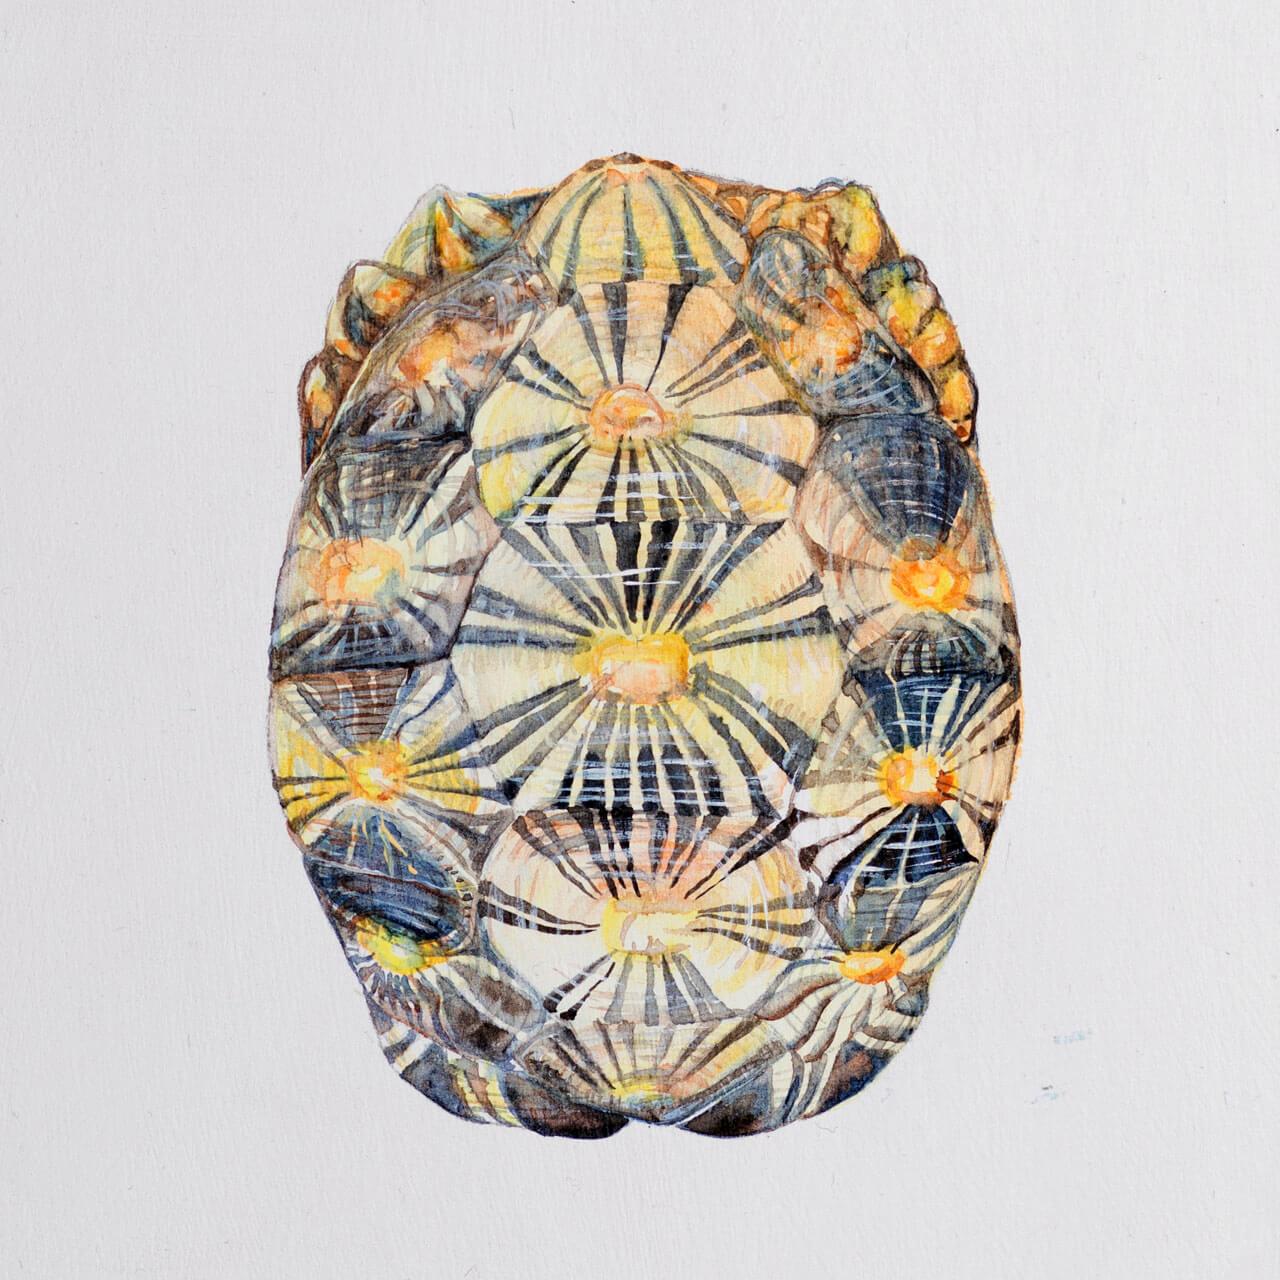 astrochelys-radiata